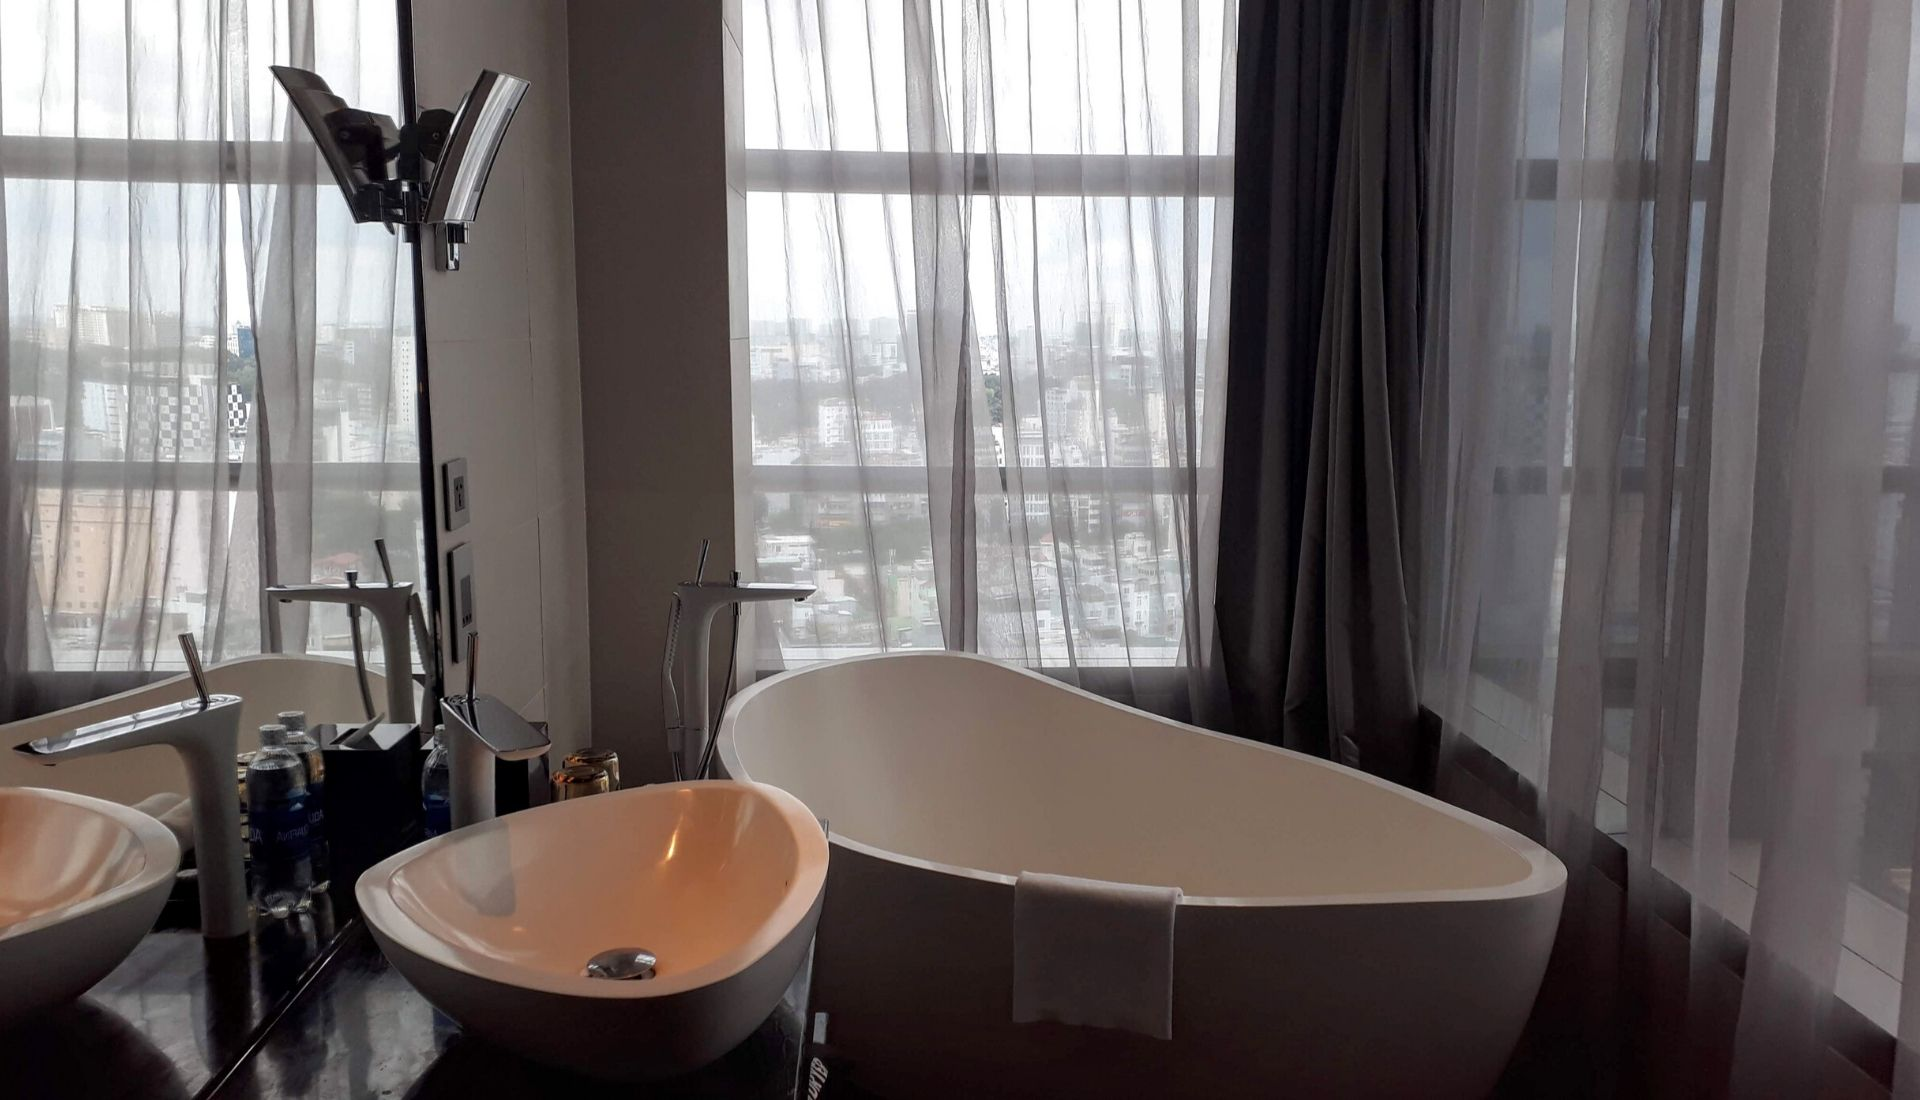 Views from the bathtub - 5 days in Saigon